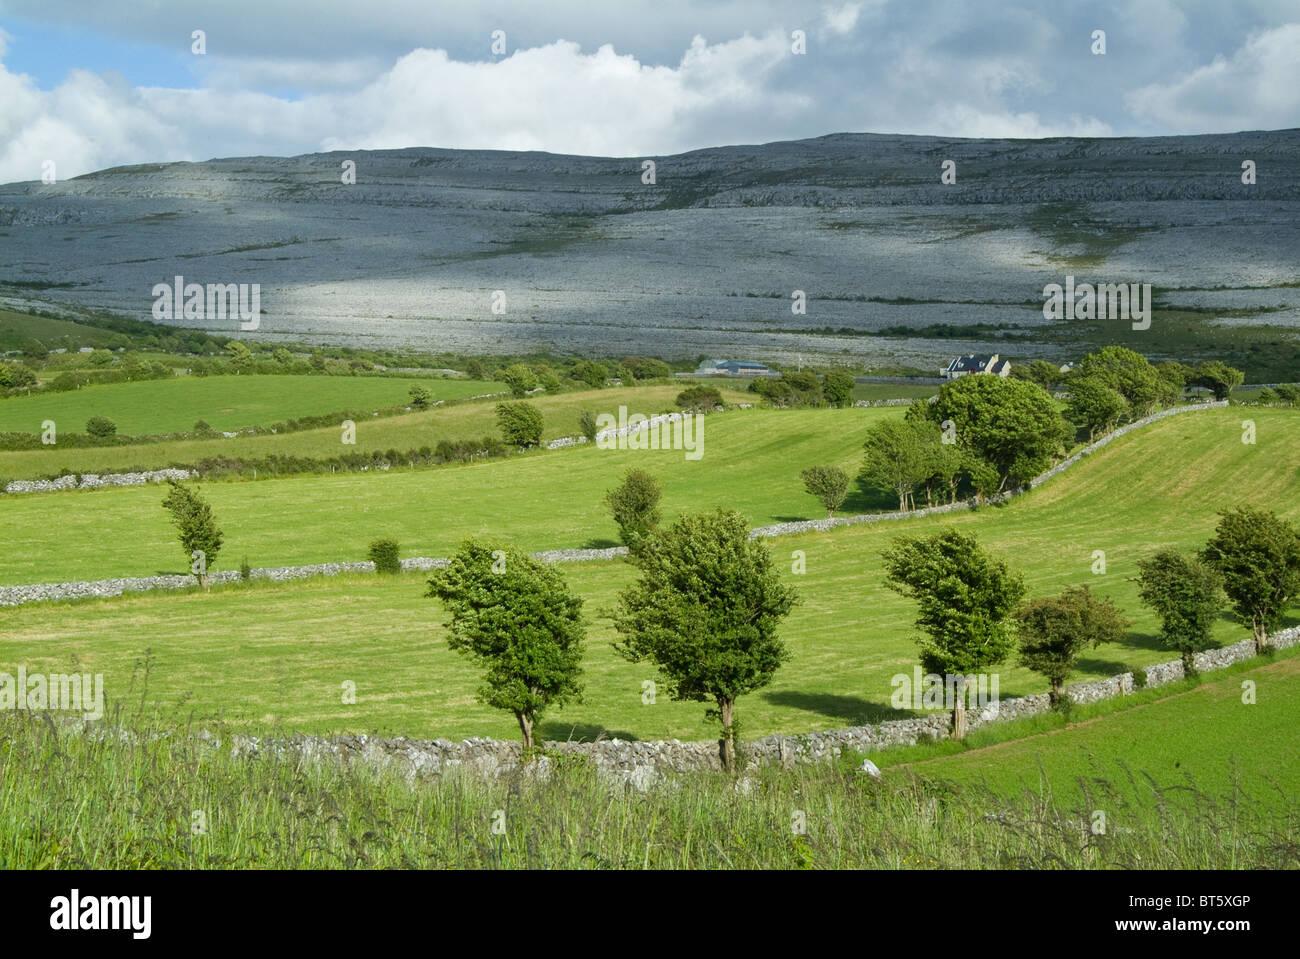 karst landscape in County Clare, Ireland Burren limestone paving in distance - Stock Image